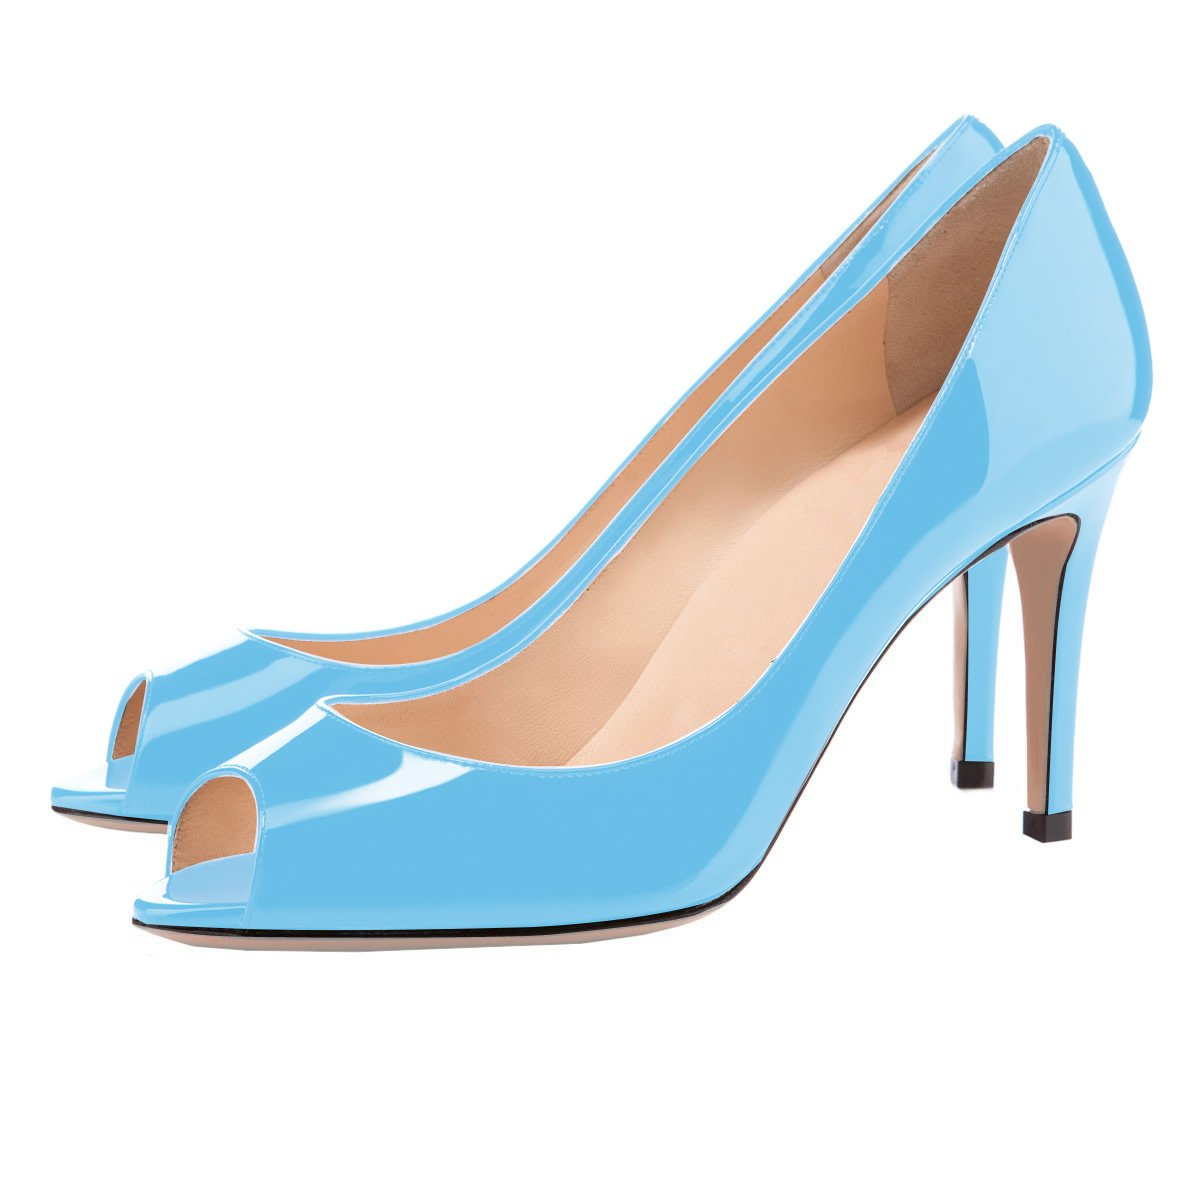 Eldof Women Peep Toe Pumps Mid-Heel Pumps Formal Wedding Bridal Classic Heel Open Toe Stiletto B07F1N354Q 5 B(M) US|Blue